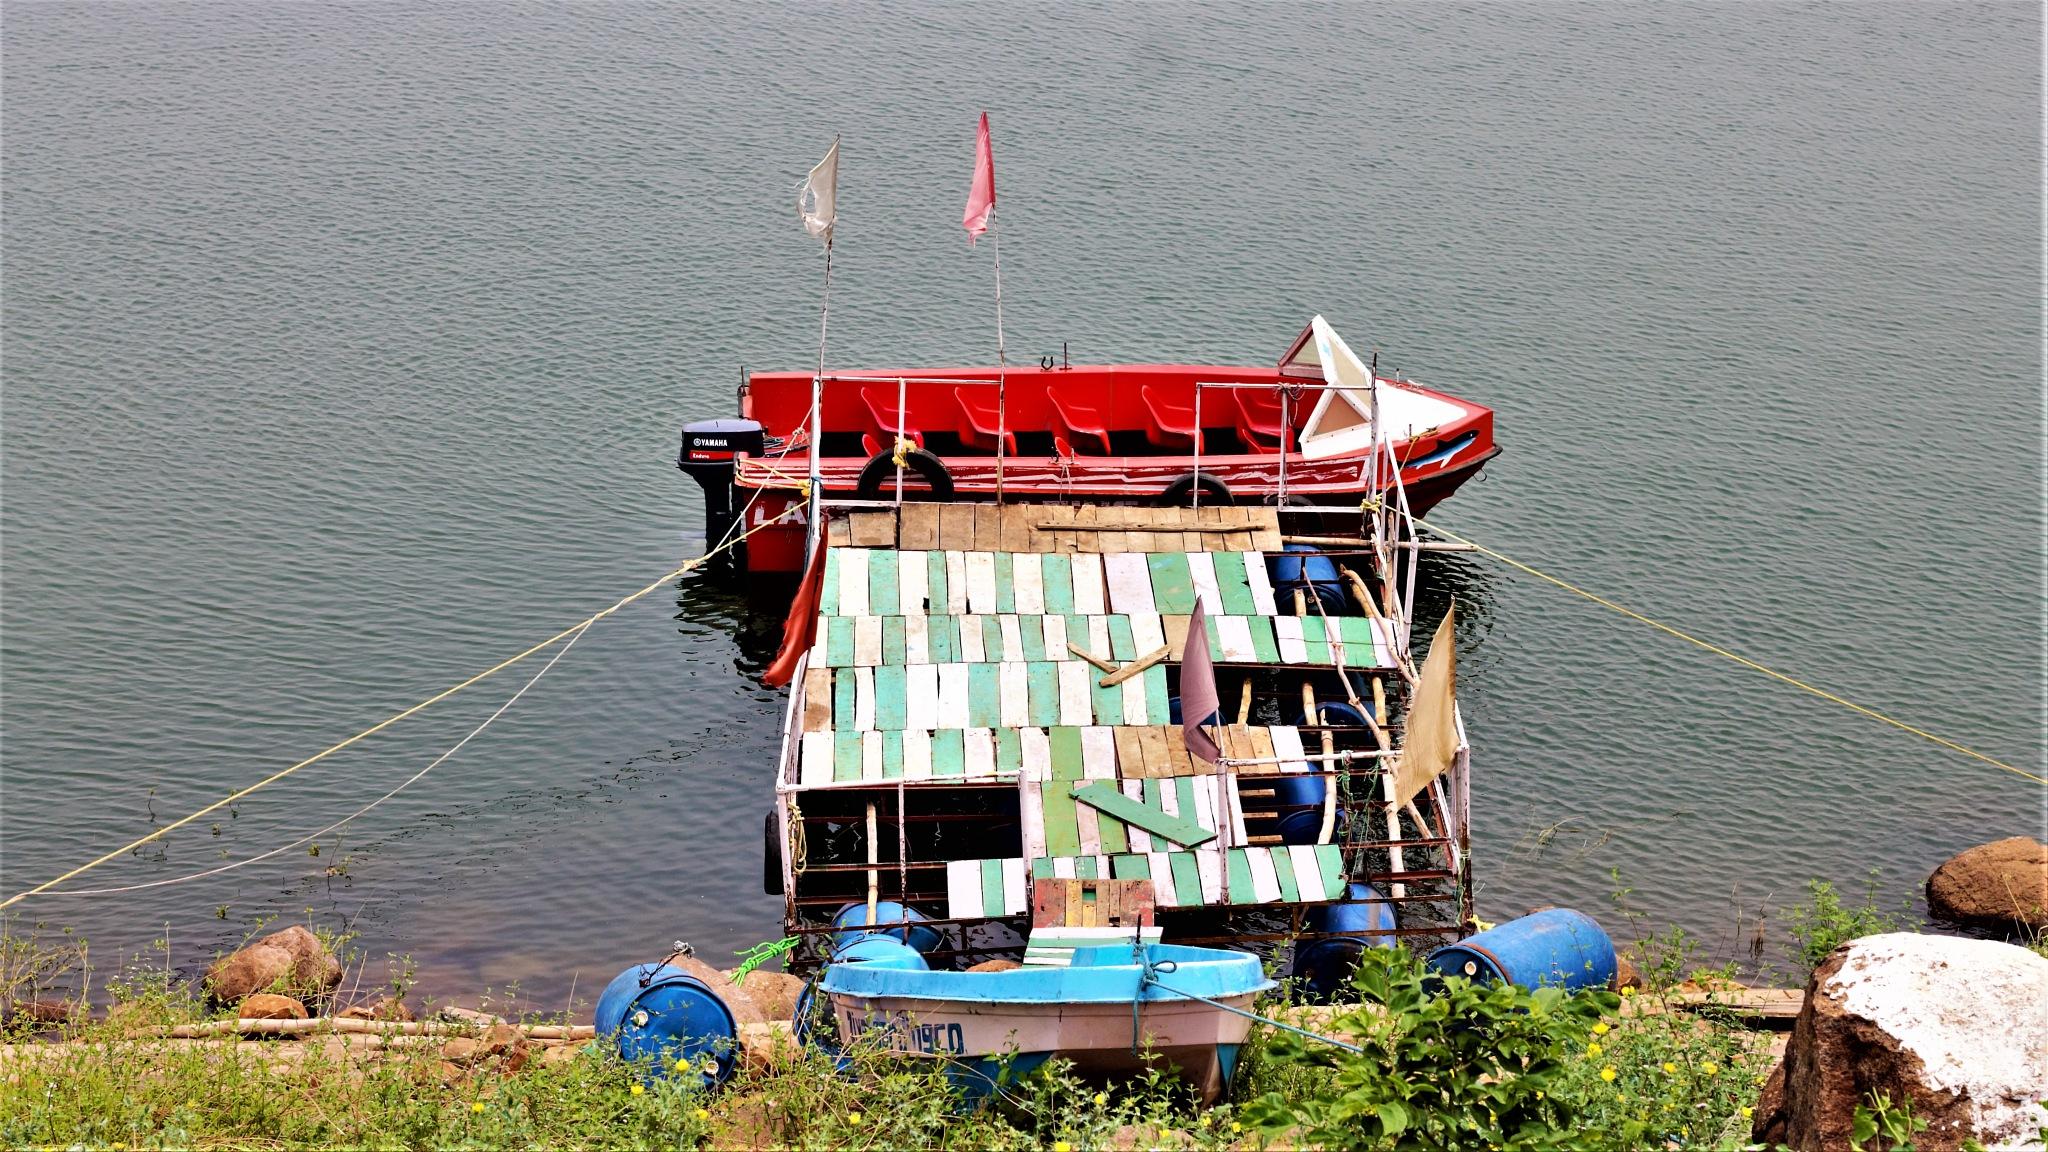 The Boat by Siddharth Sanyal